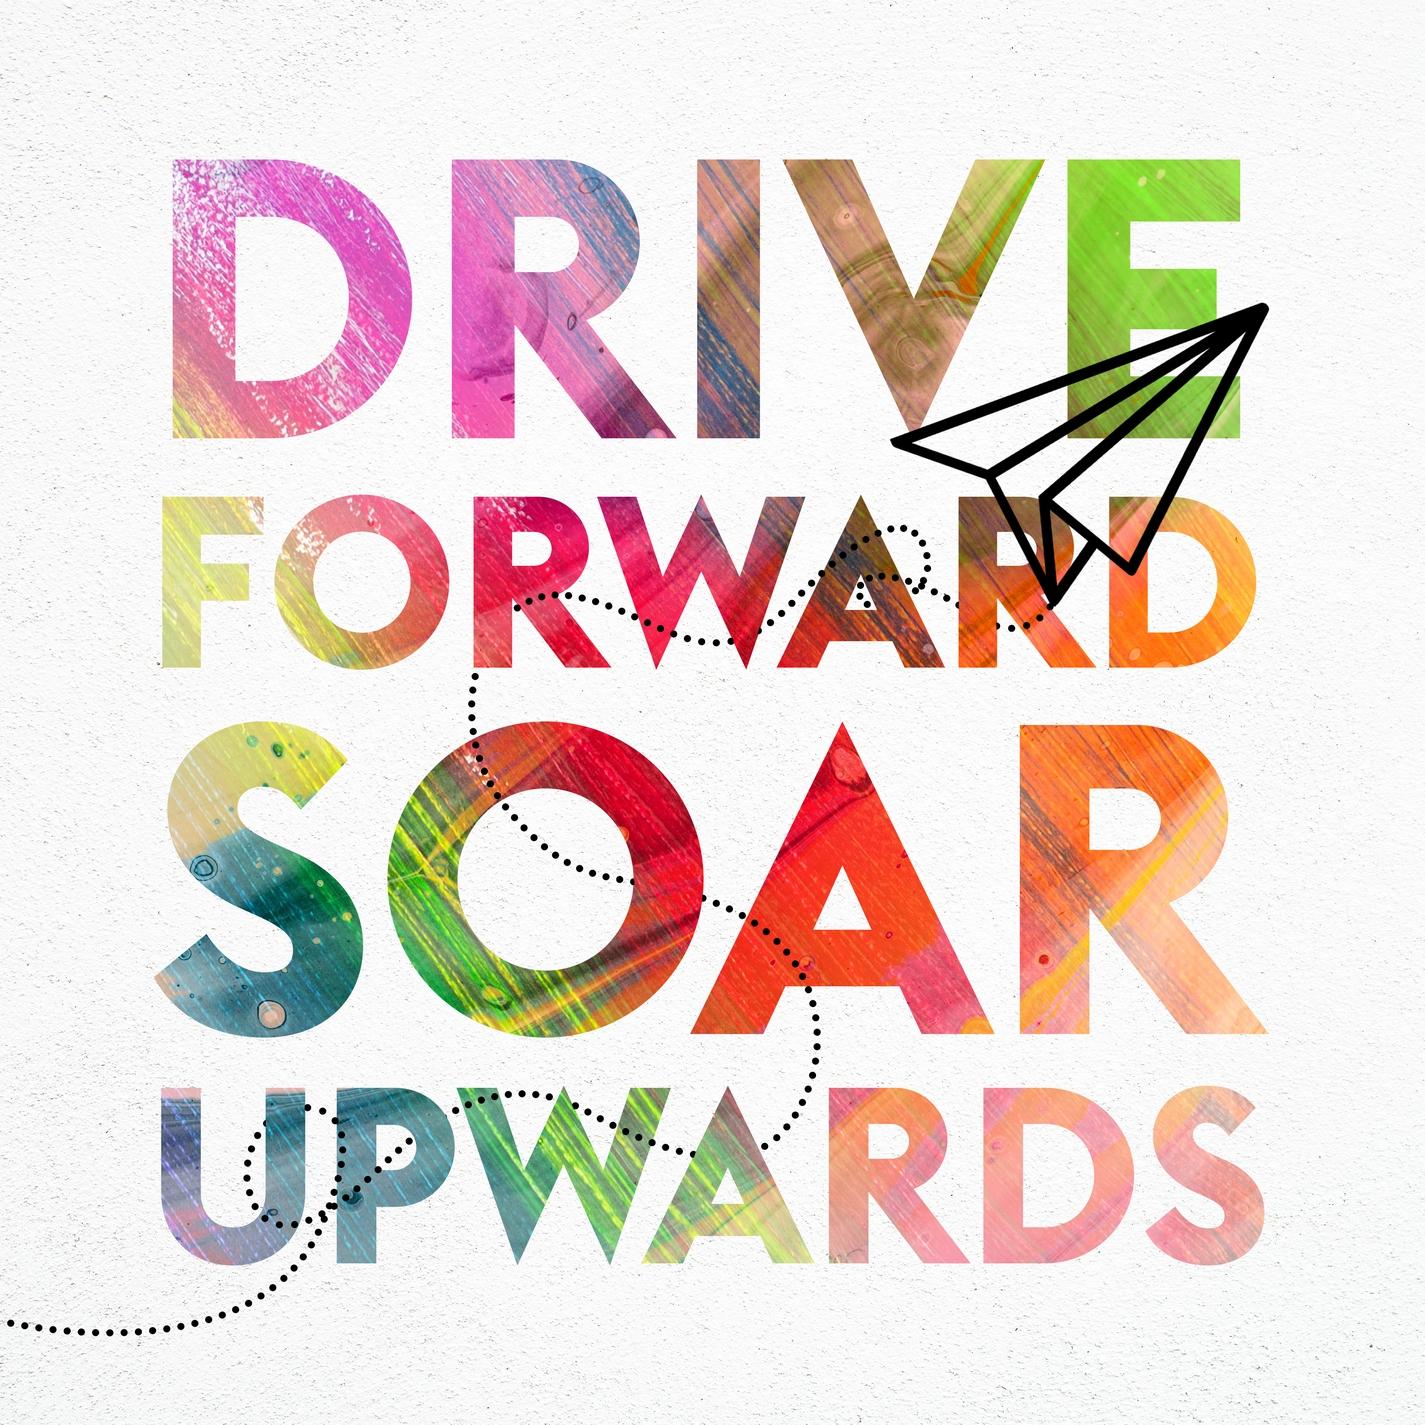 Drive Forward Soar Upward